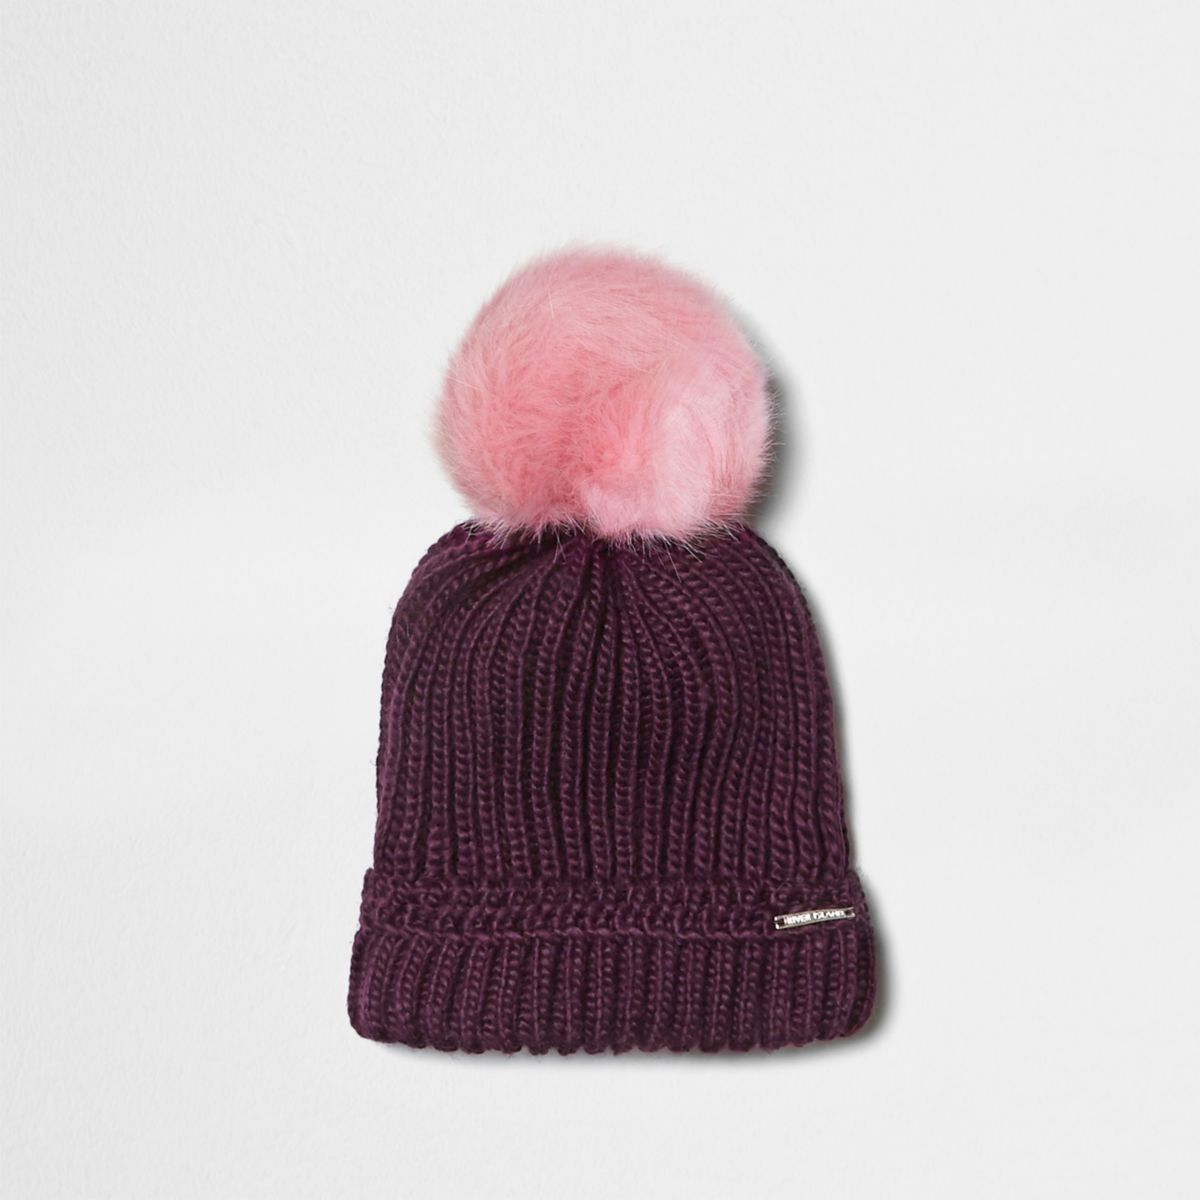 Burgundy faux fur bobble beanie hat